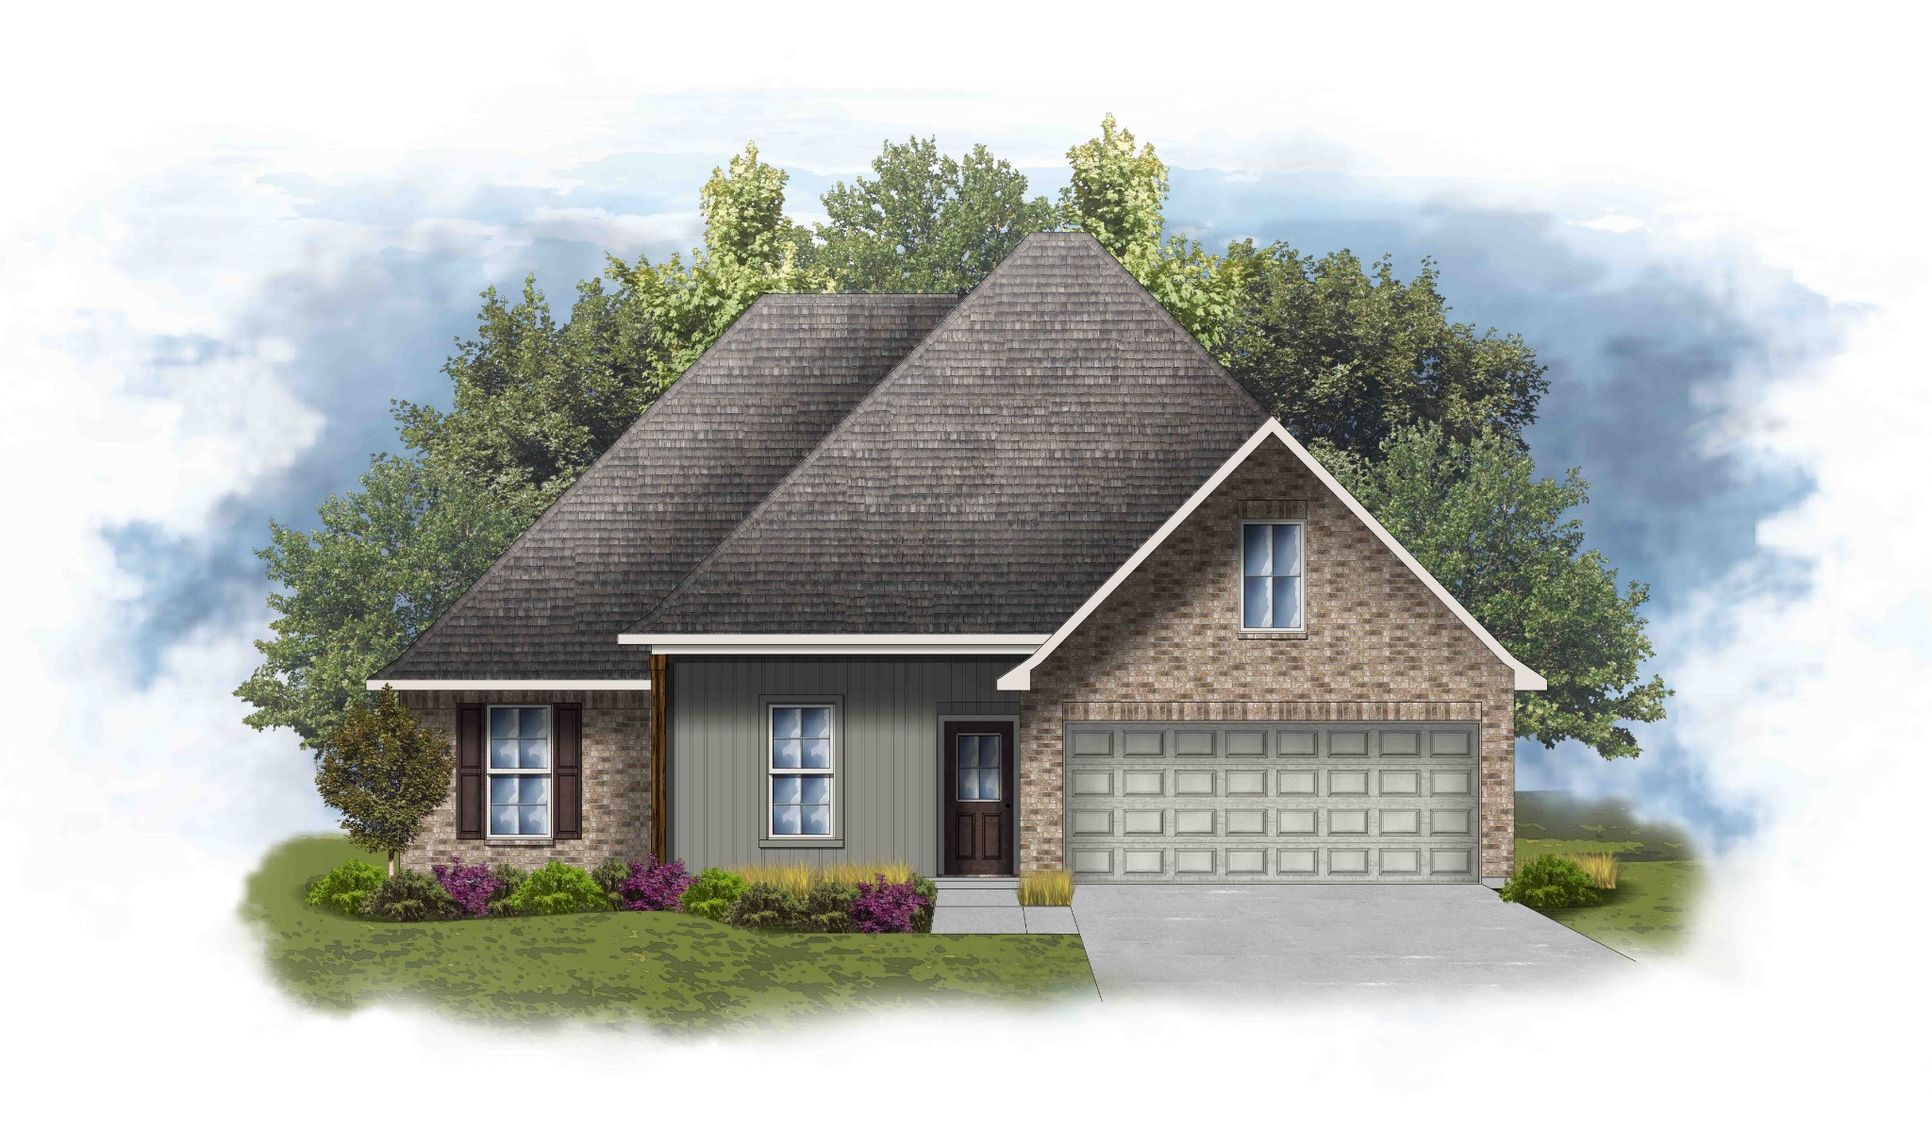 Roxboro IV H Floor Plan Elevation Image - DSLD Homes